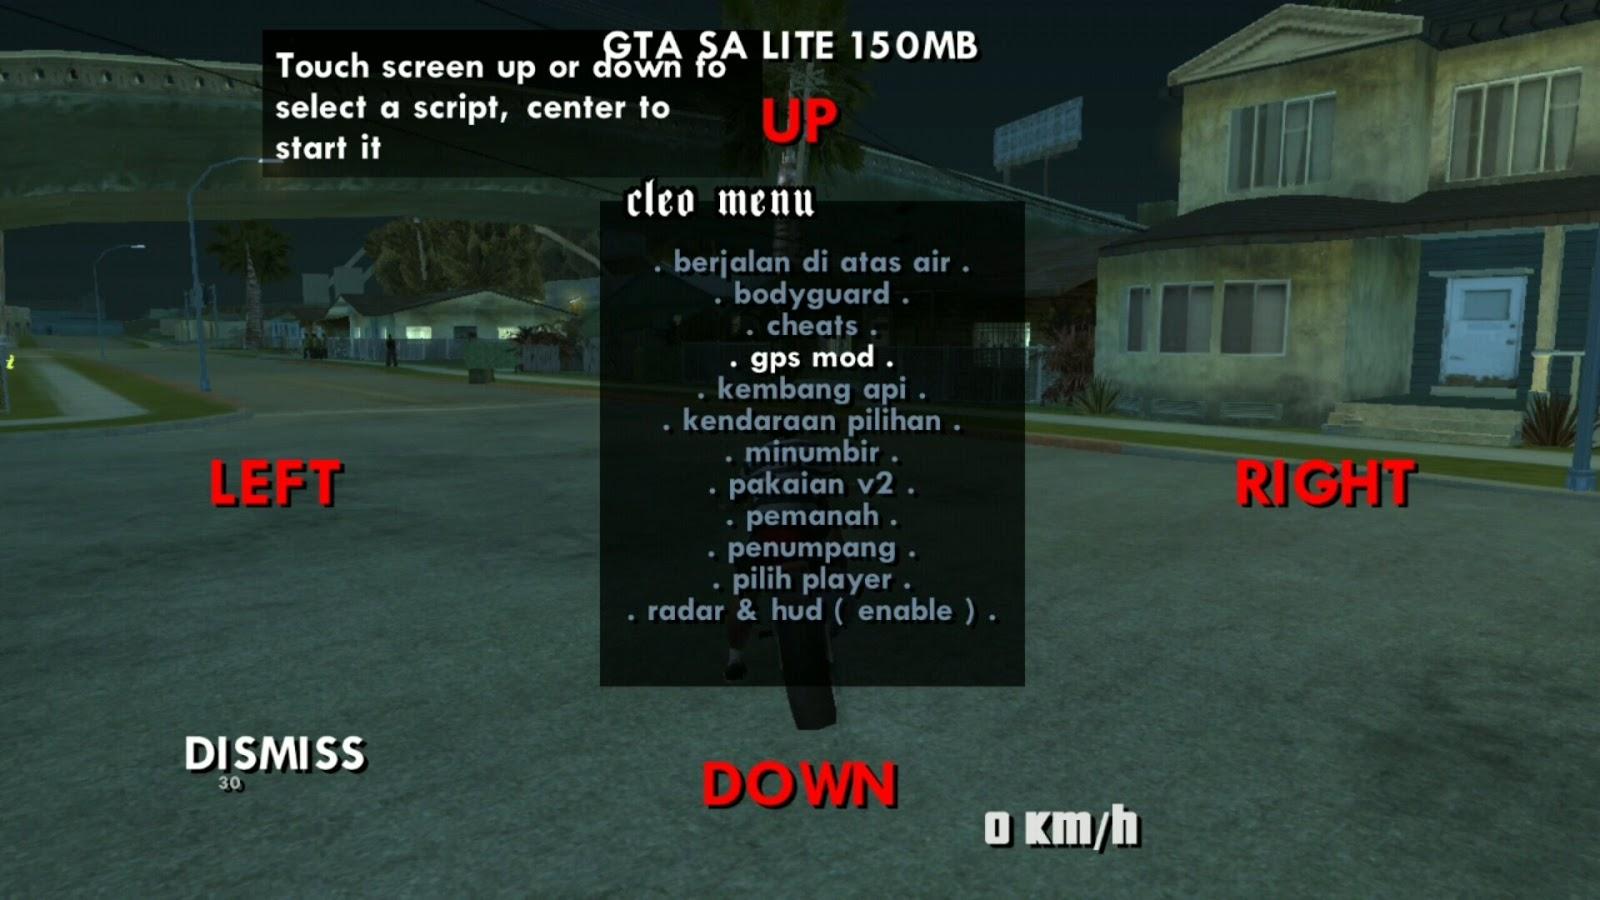 Download gta sa lite indonesia by ilham_51 apk